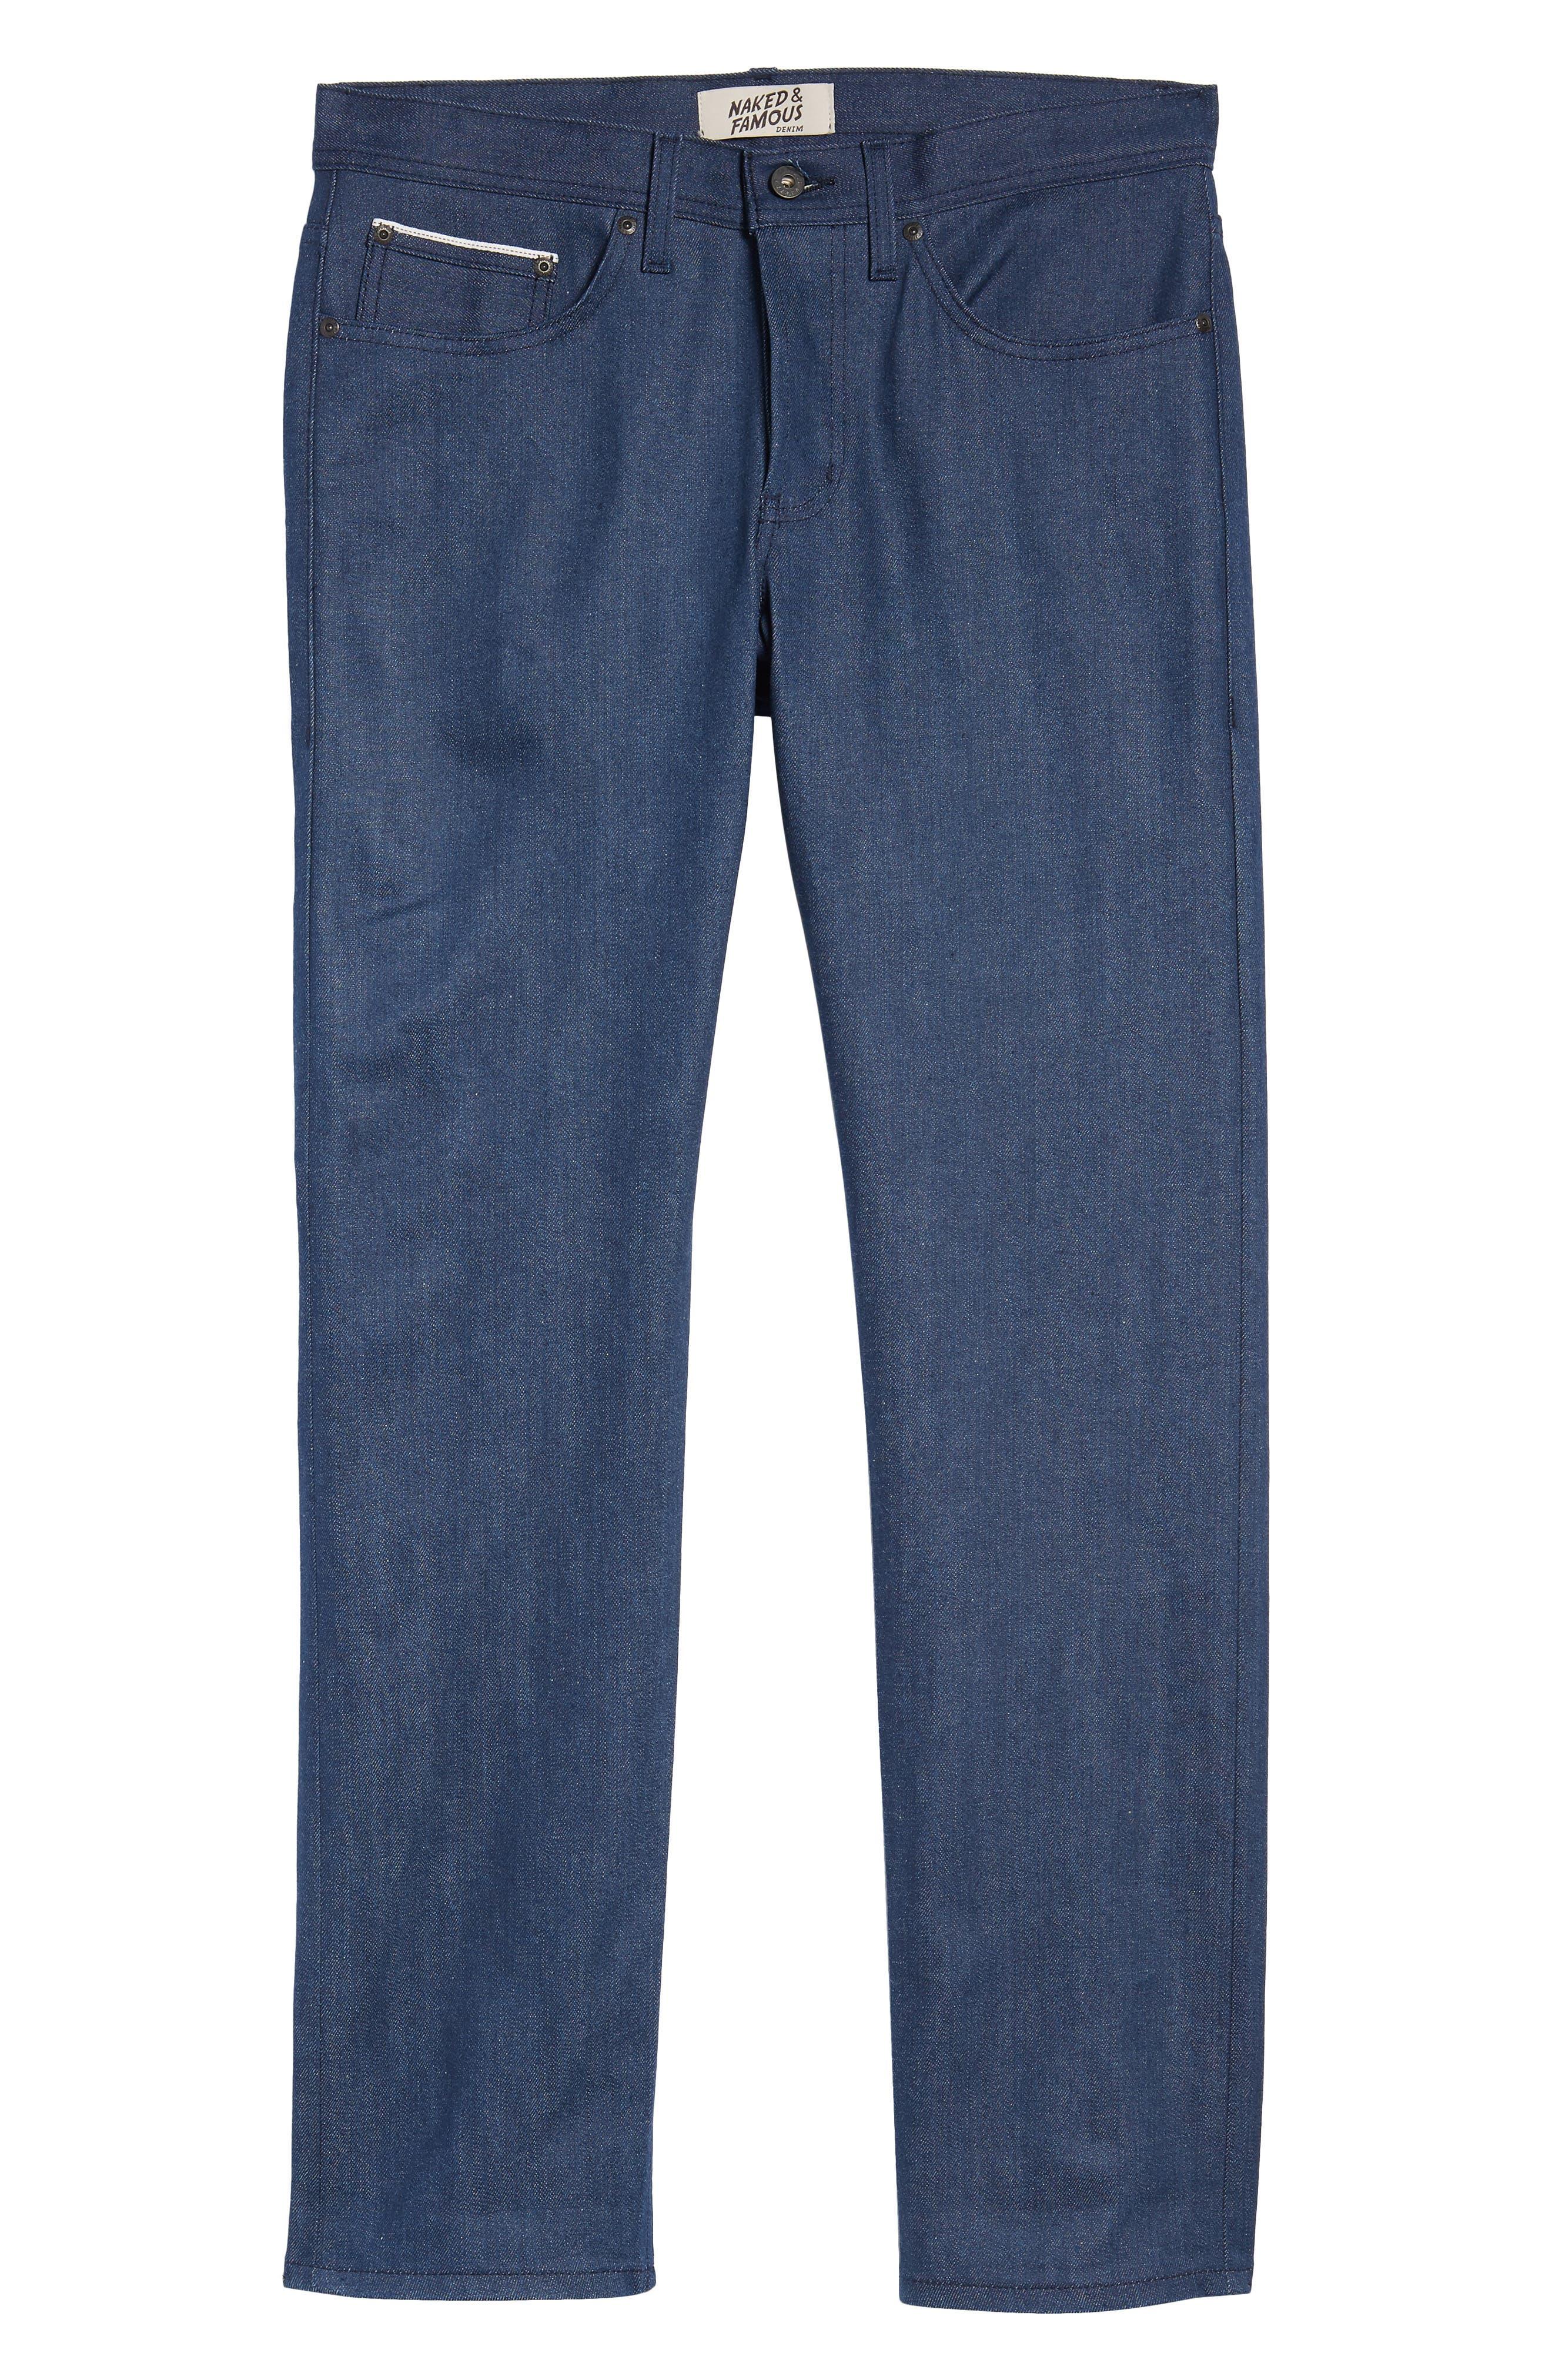 Weird Guy Slim Fit Jeans,                             Alternate thumbnail 6, color,                             Workmans Blue